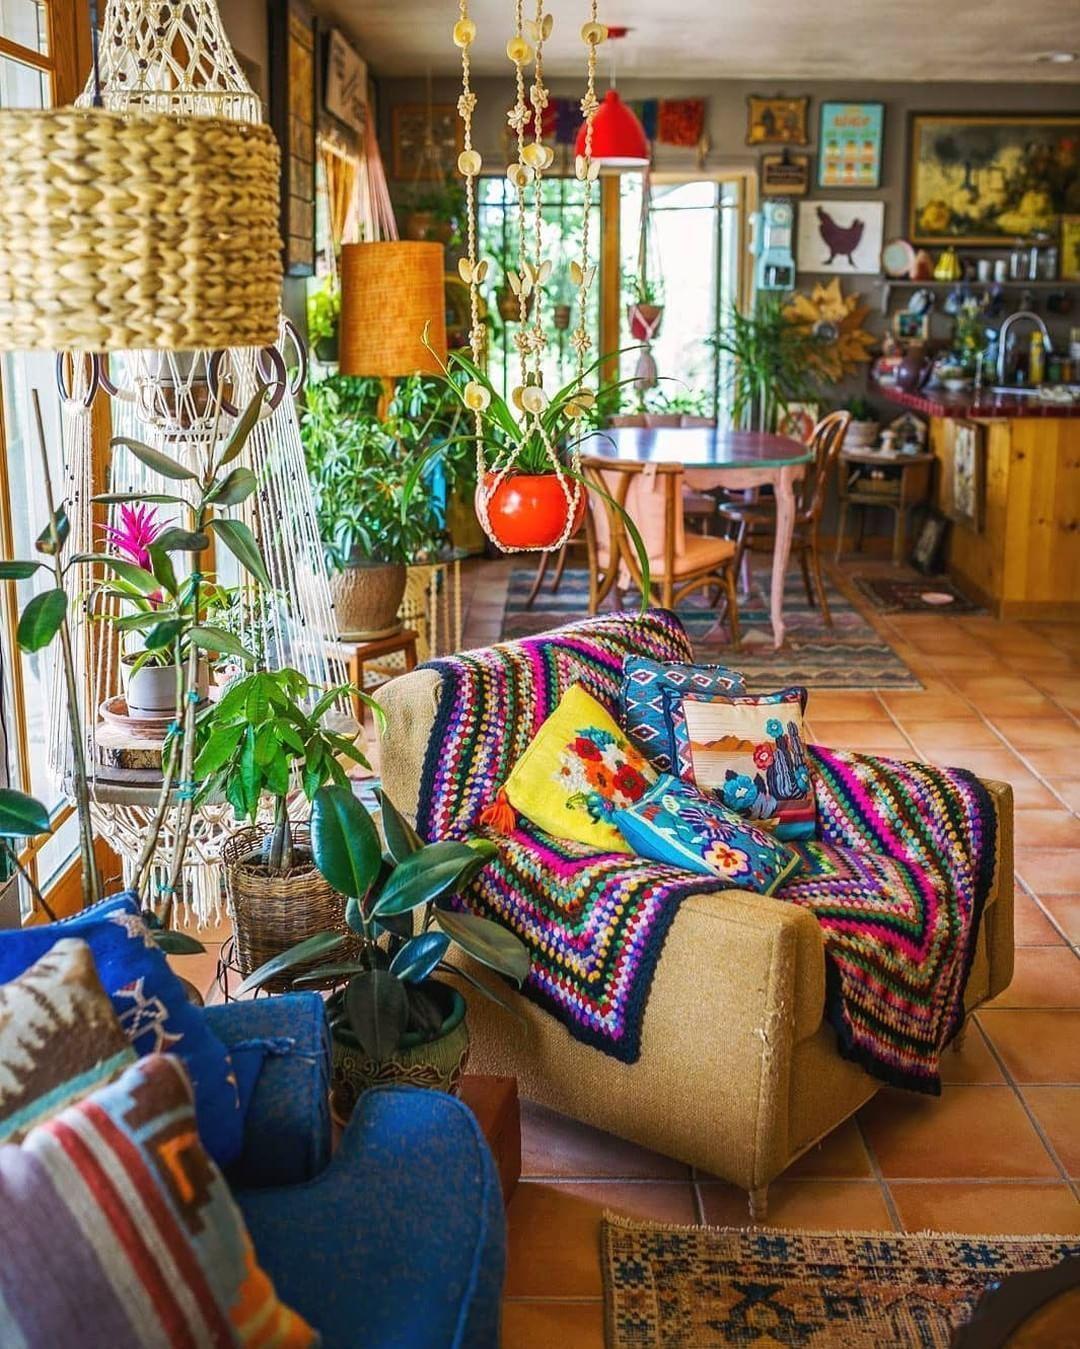 25 Boho Style Home Decor Ideas Jessedaro Vintage Home Decor Decor Room Decor